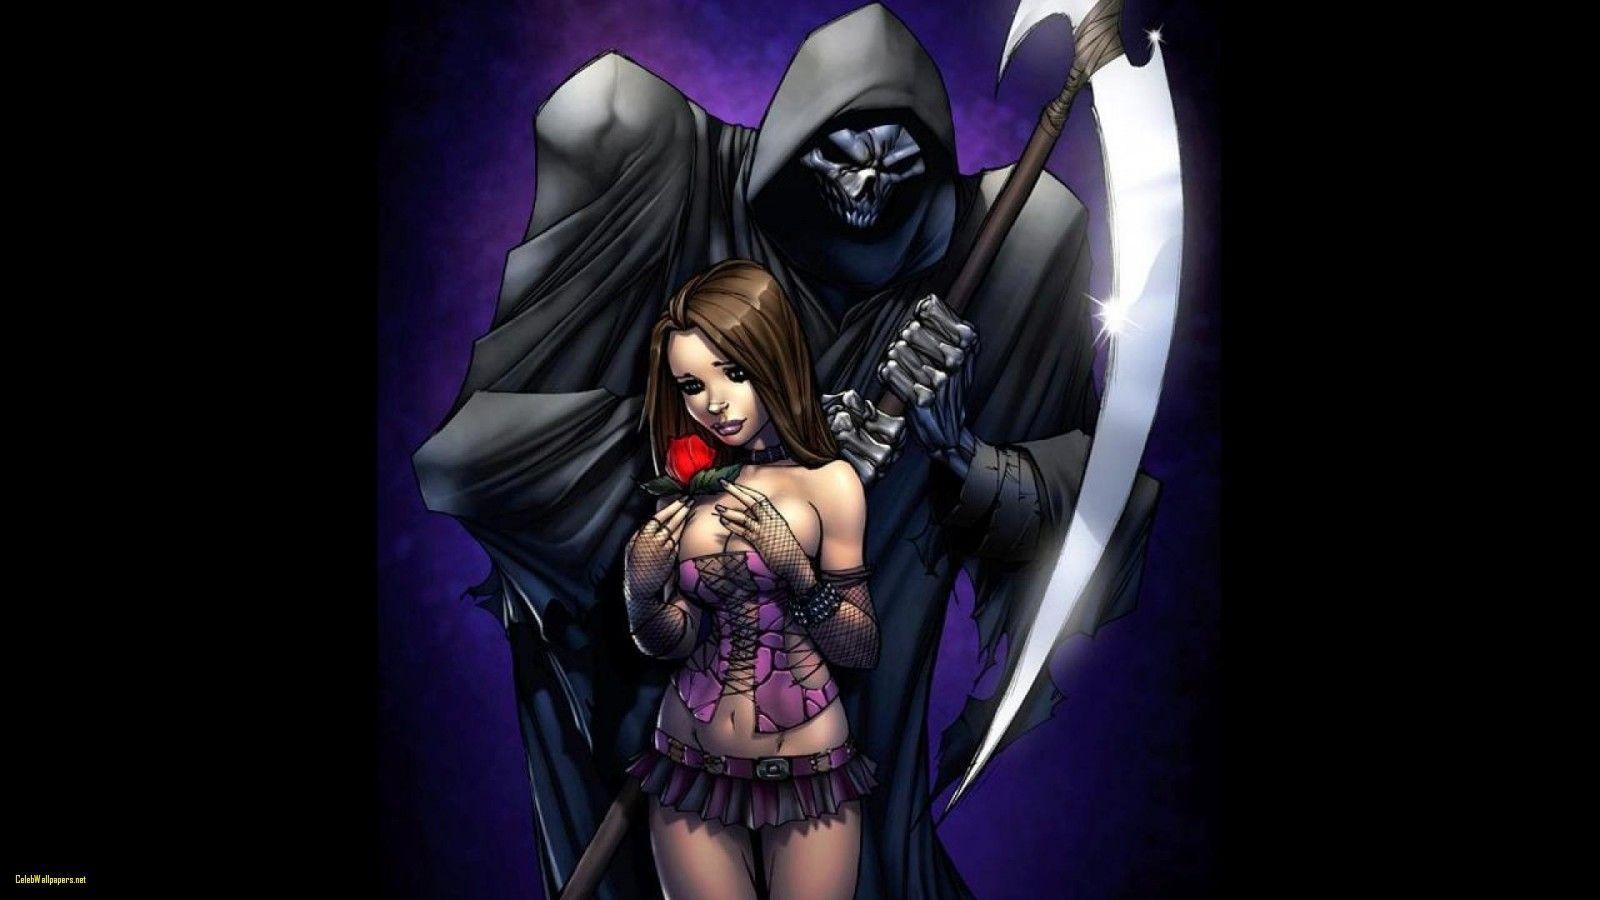 "1600x1200 Grim Reaper Wallpaper Awesome and Free Grim Reaper Wallpaper Hd ..."">"